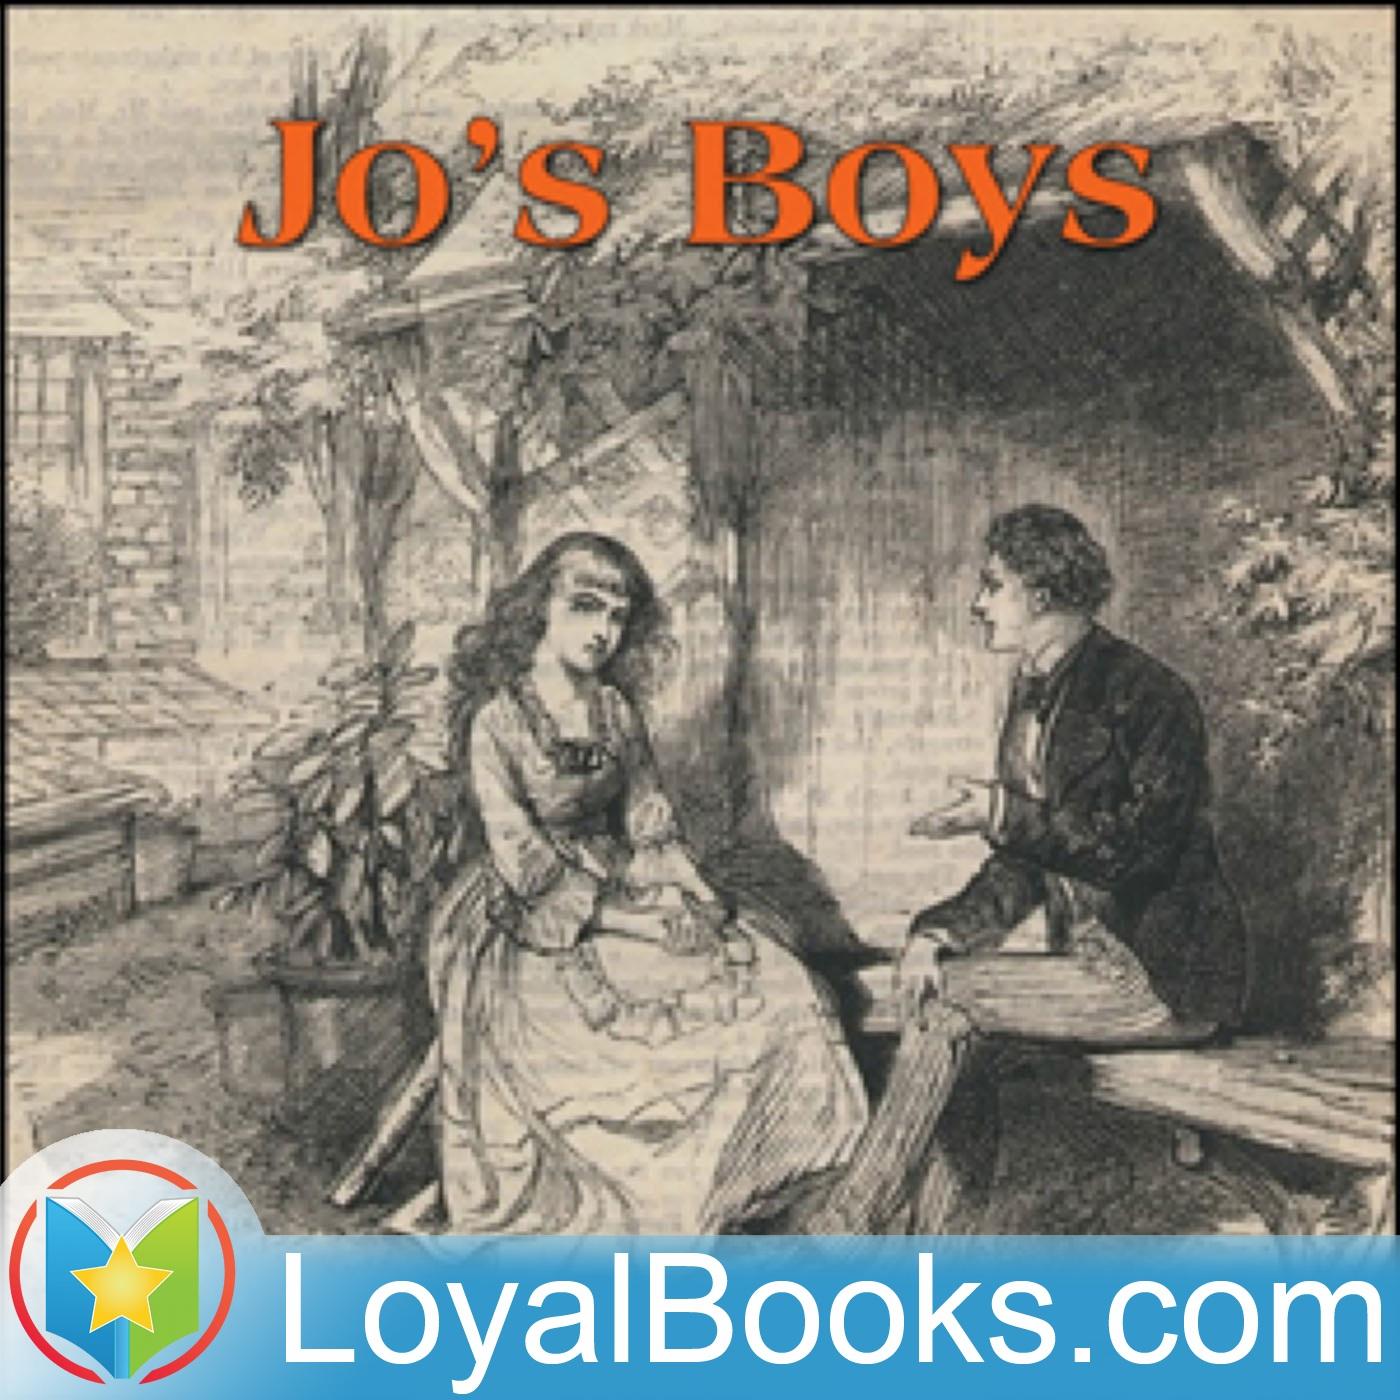 <![CDATA[Jo's Boys by Louisa May Alcott]]>